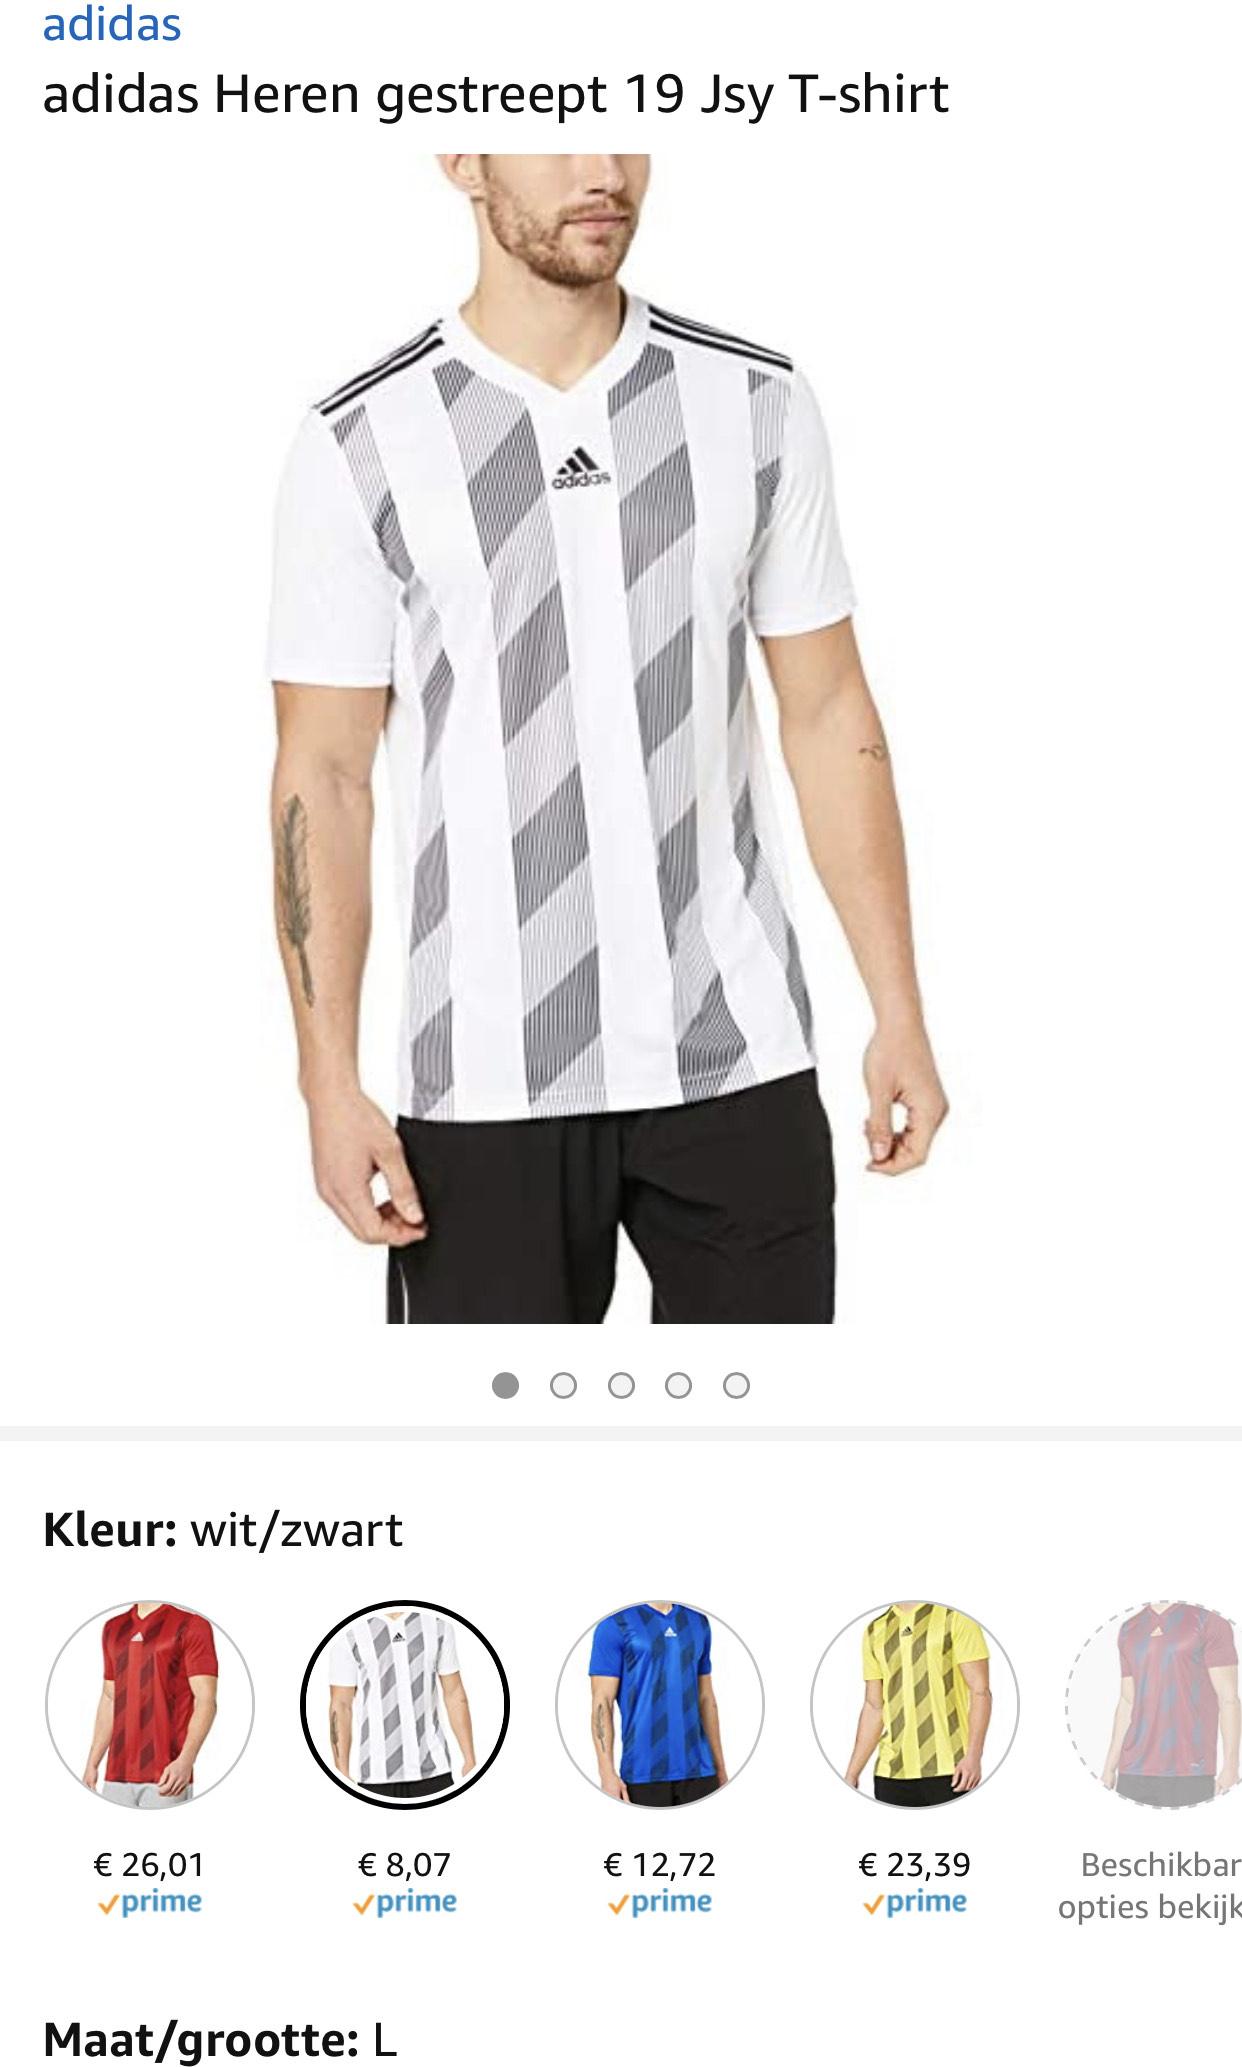 adidas Heren gestreept T-shirt vanaf €8,07